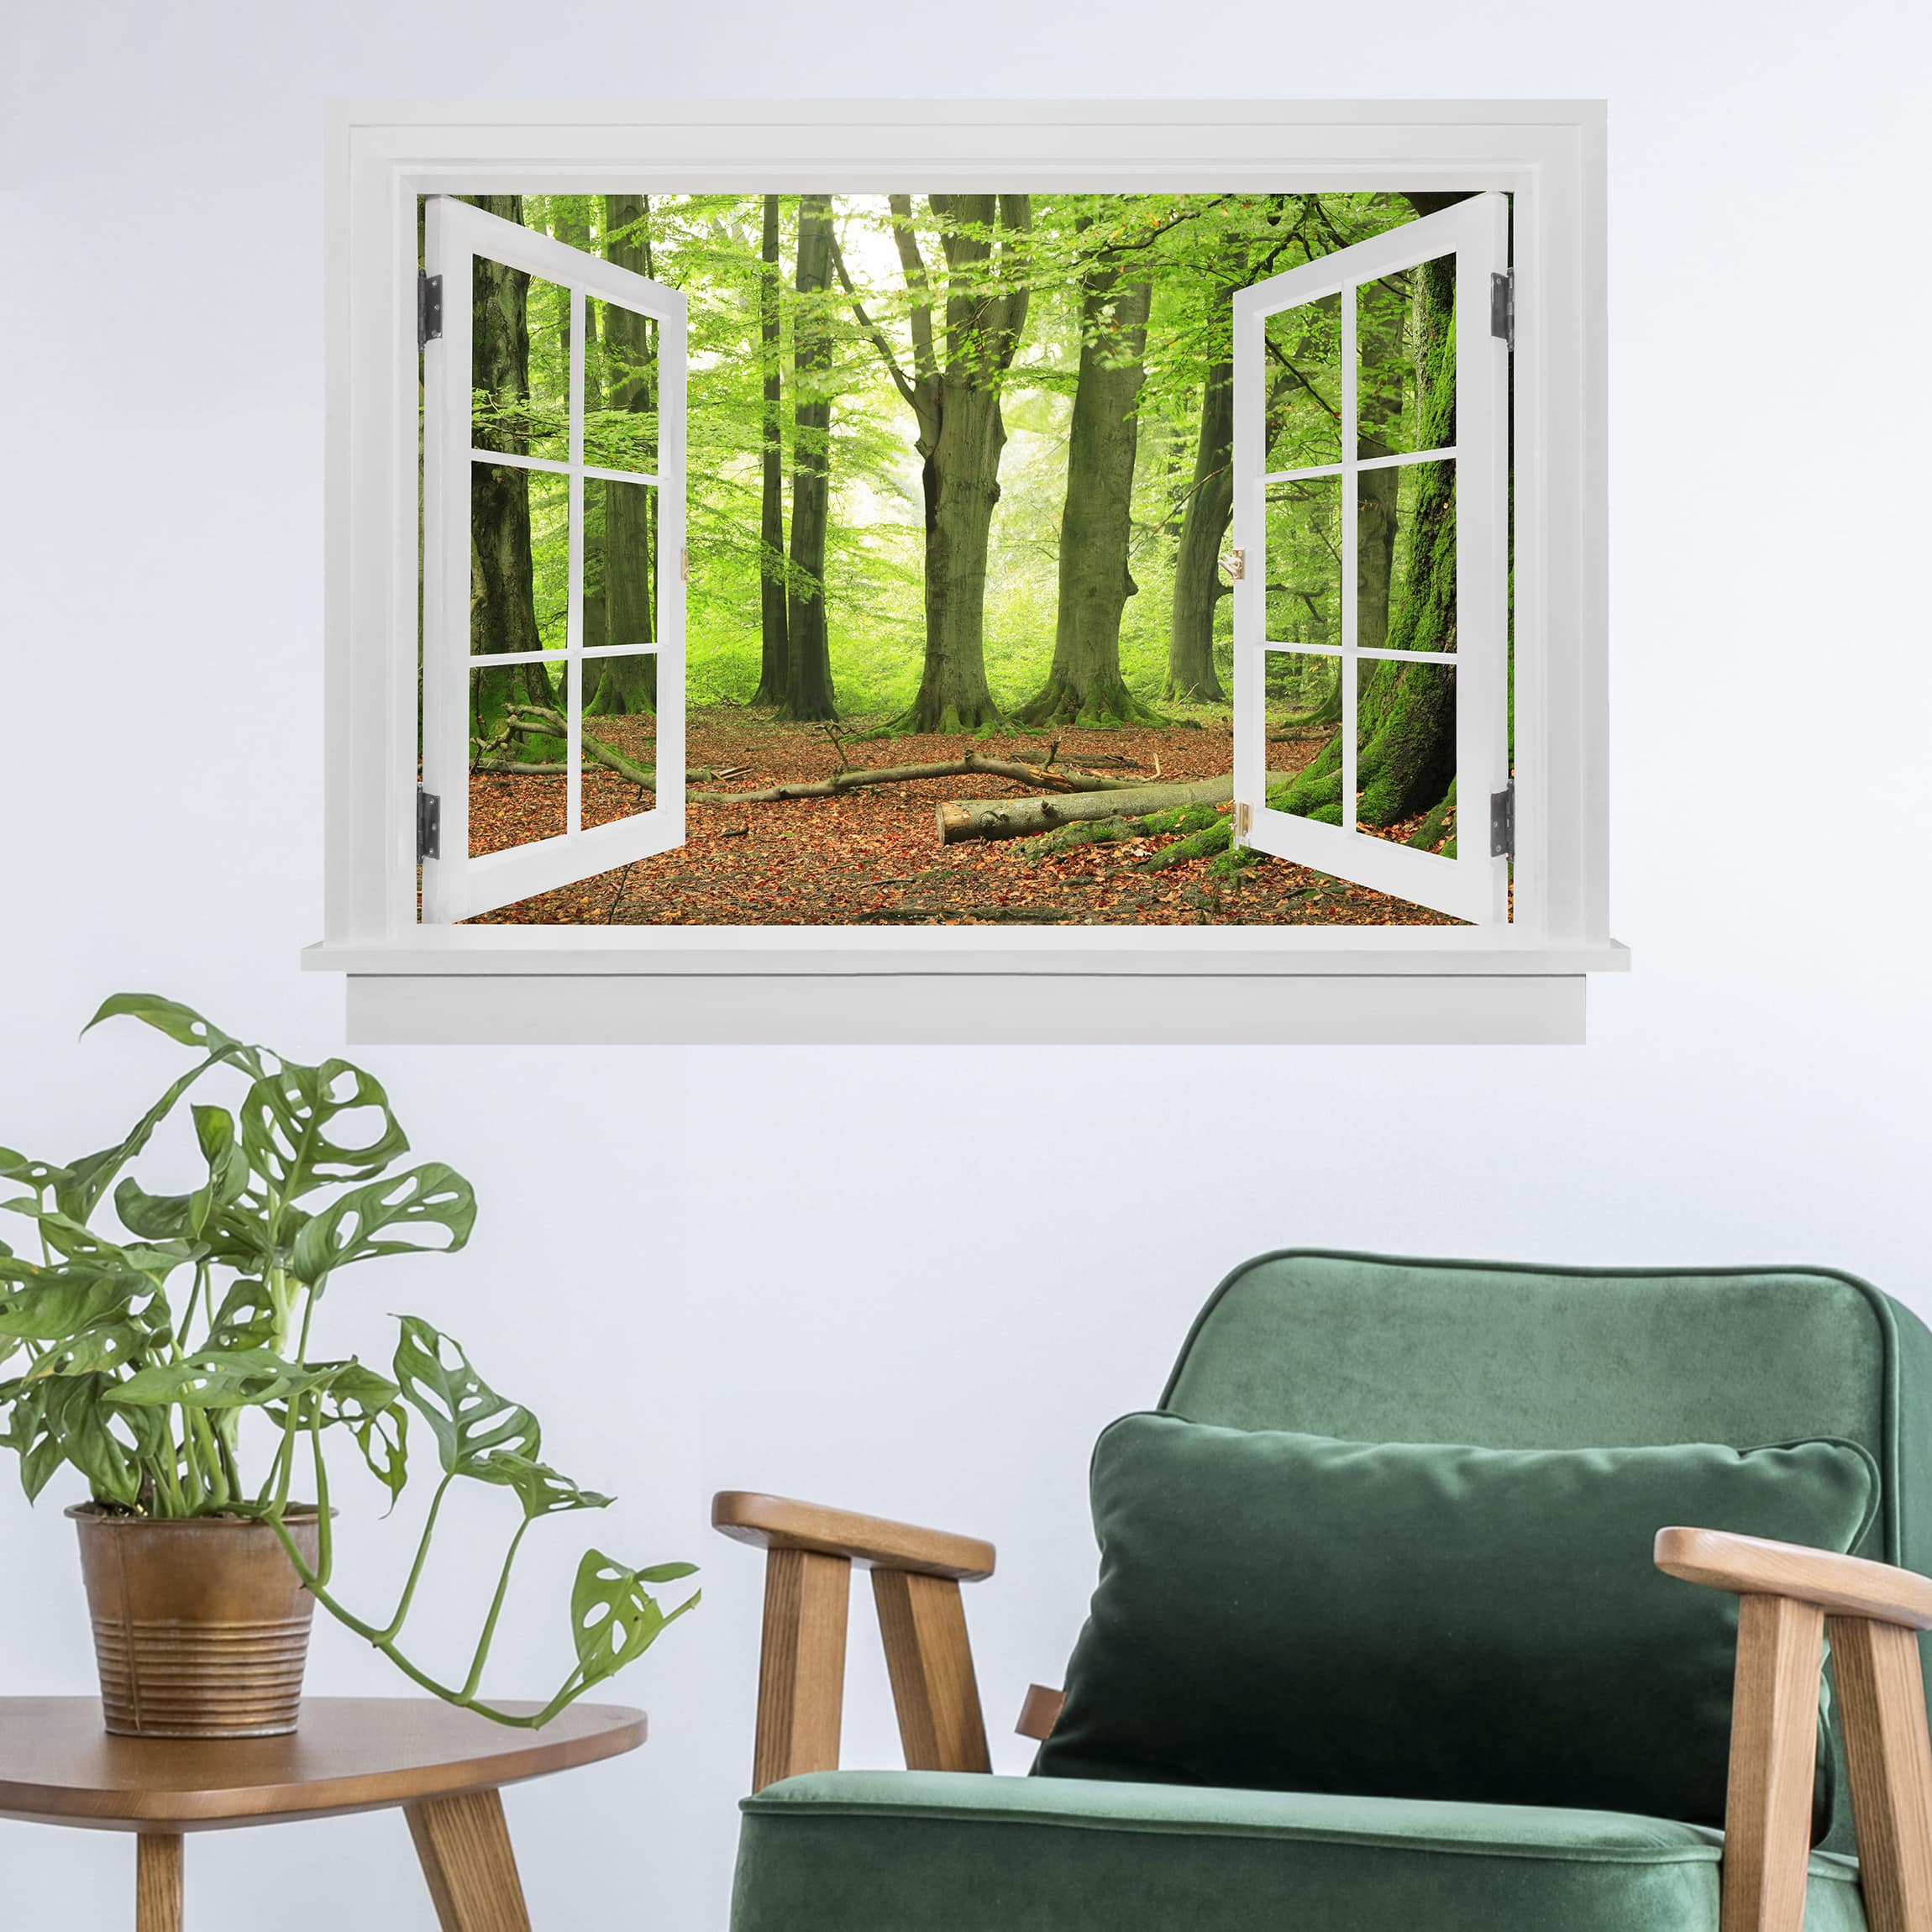 Trompe L Oeil Adesivi Murali.Trompe L Oeil Adesivi Murali Finestra Aperta Mighty Beech Trees